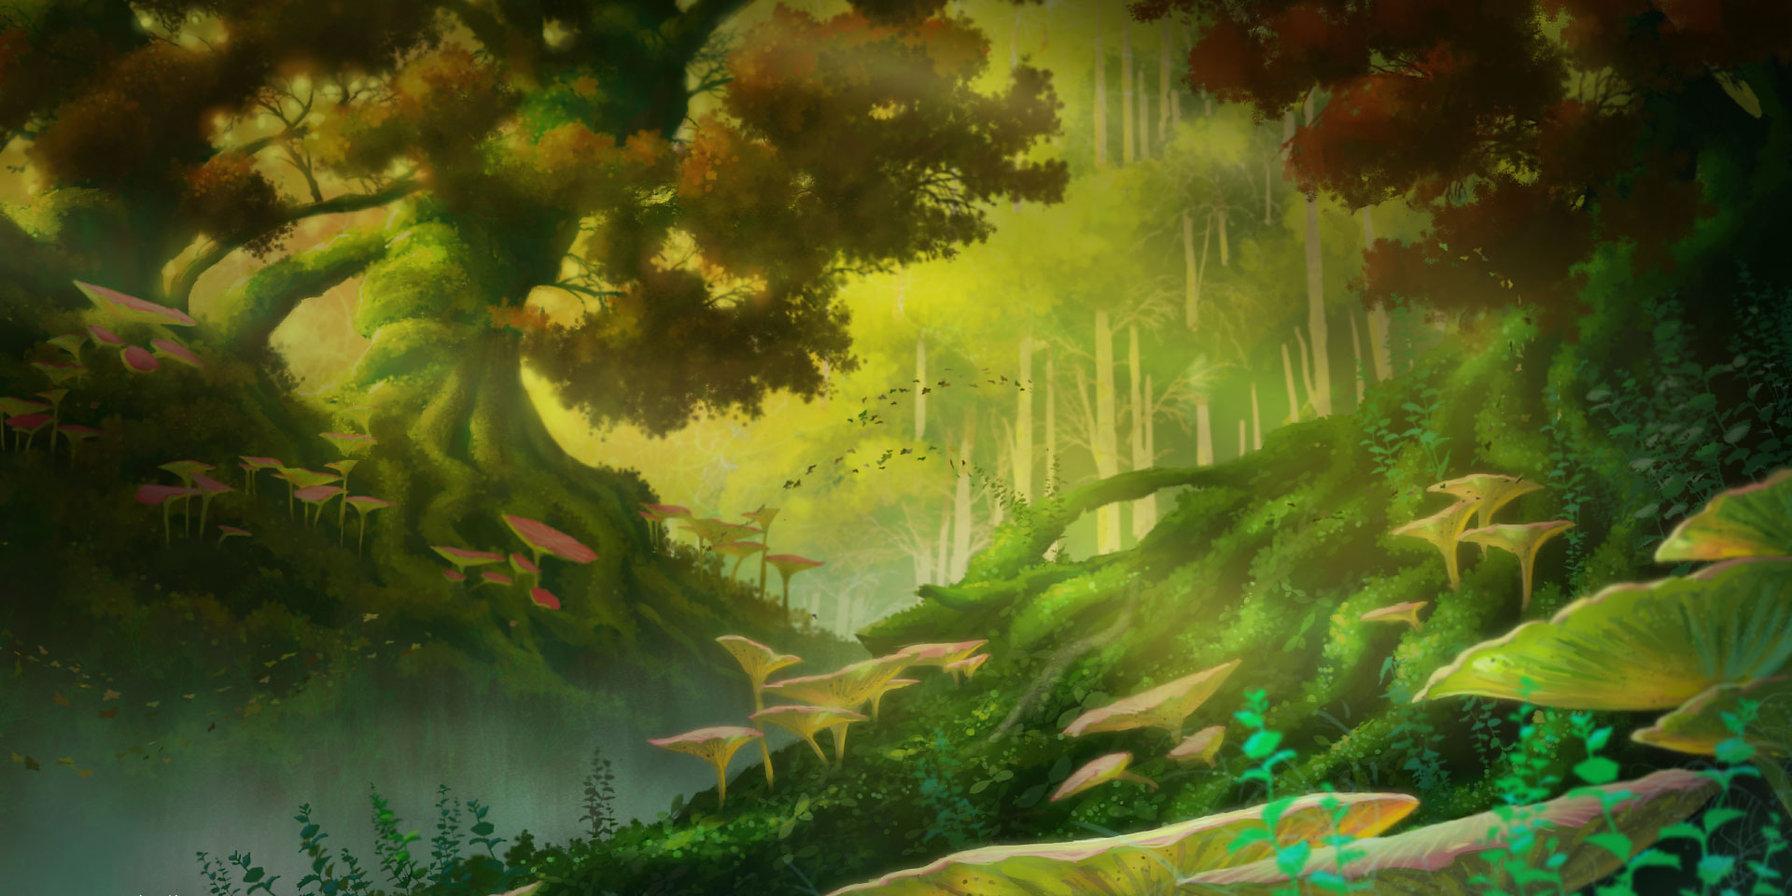 forestias-bg.jpg